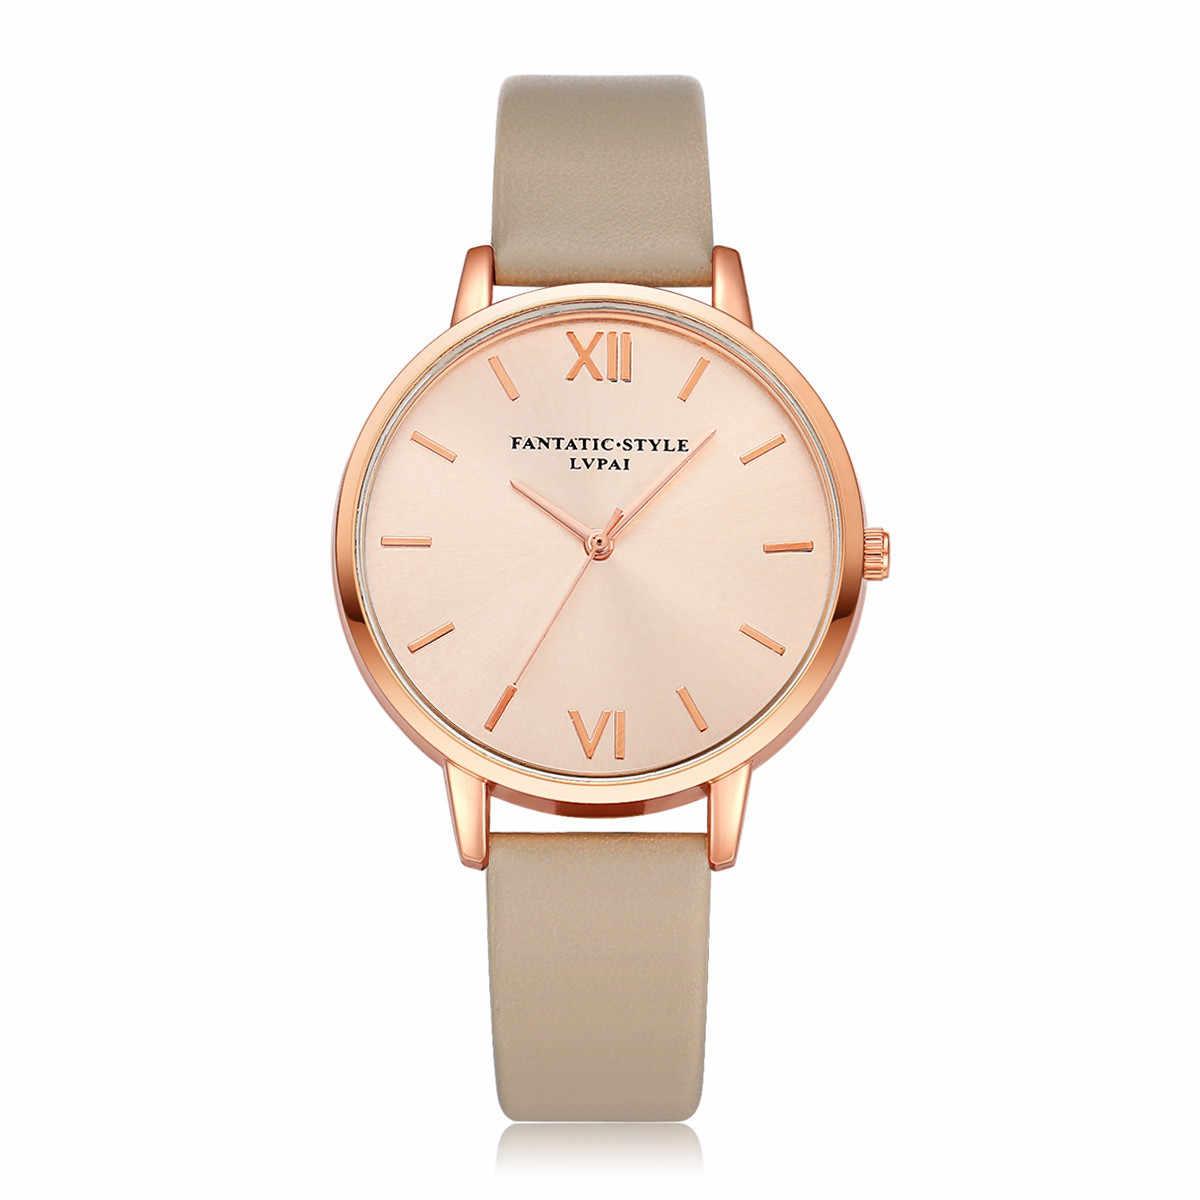 6cc28f002 ... Popular Top Brand Luxury Girls Watches Women Stylish Quartz Wristwatch  Clock Ladies Fashion Dress Gift Watch ...